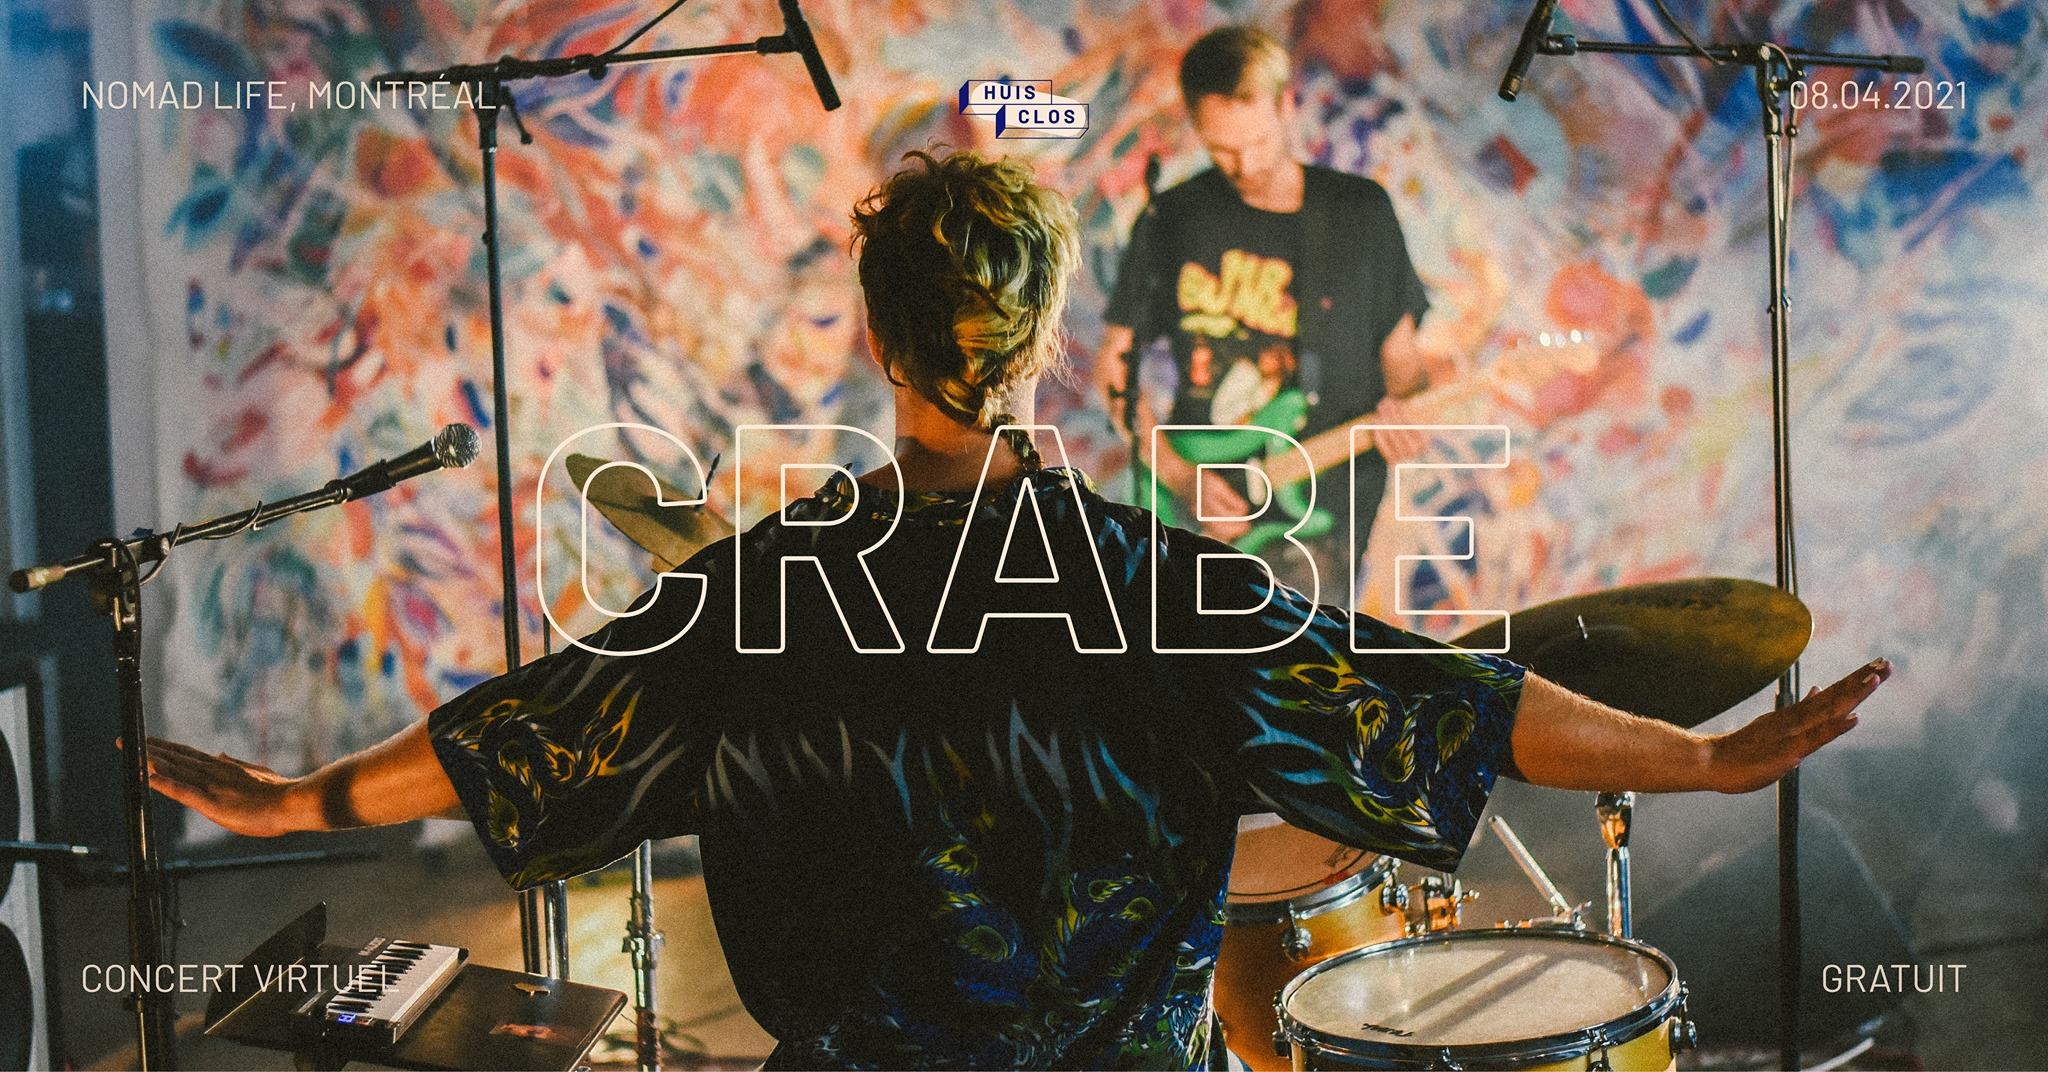 Crabe (Huis Clos) 2021